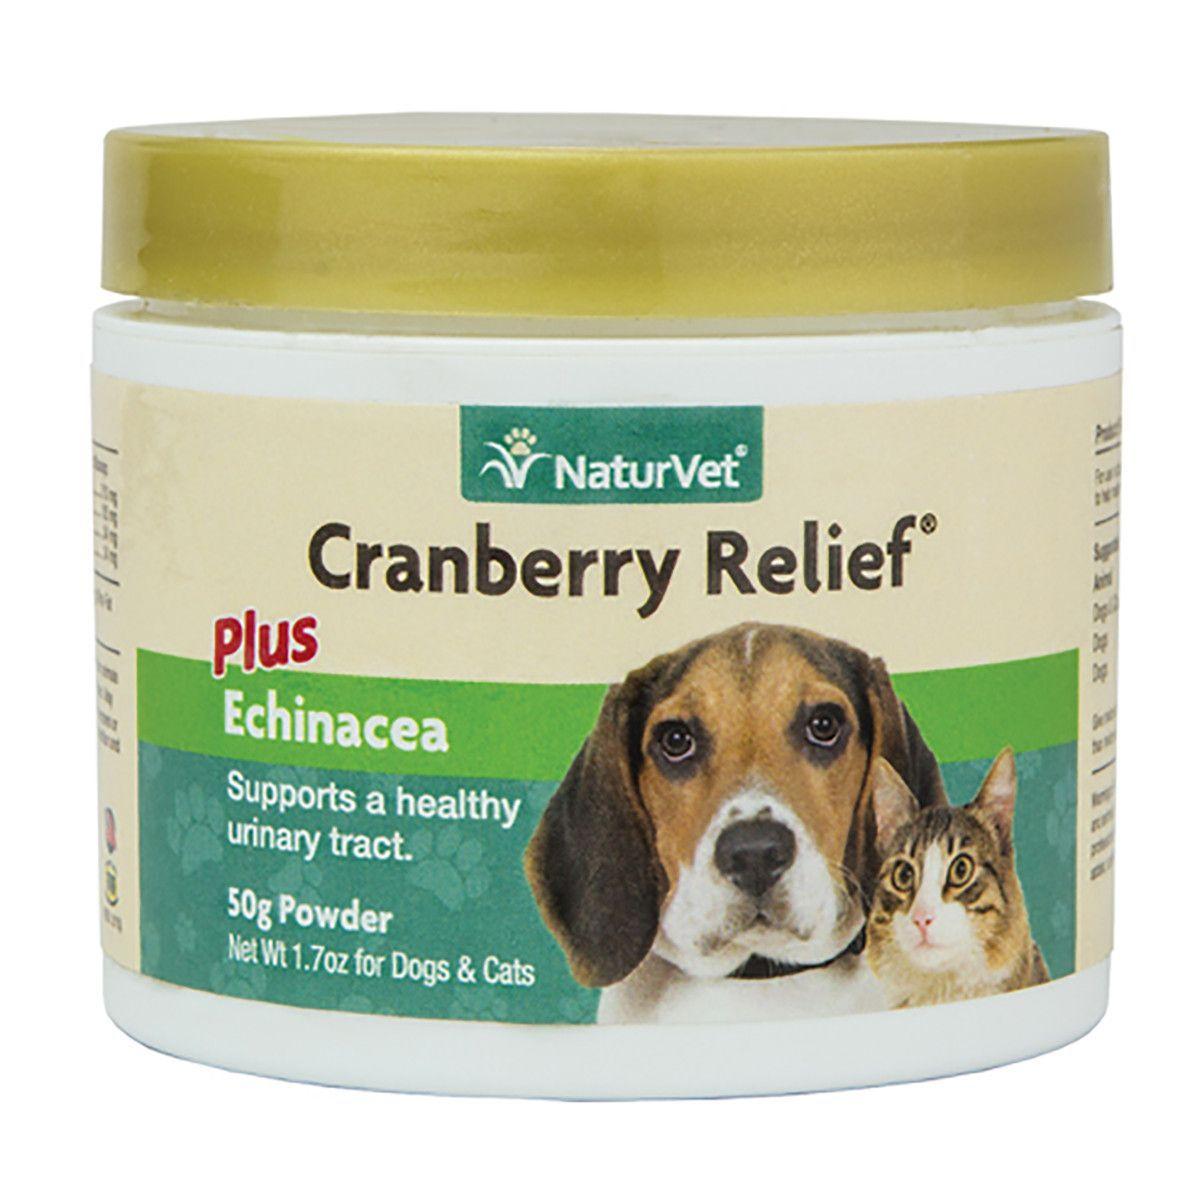 Cranberry Relief Pet Powder By Naturvet